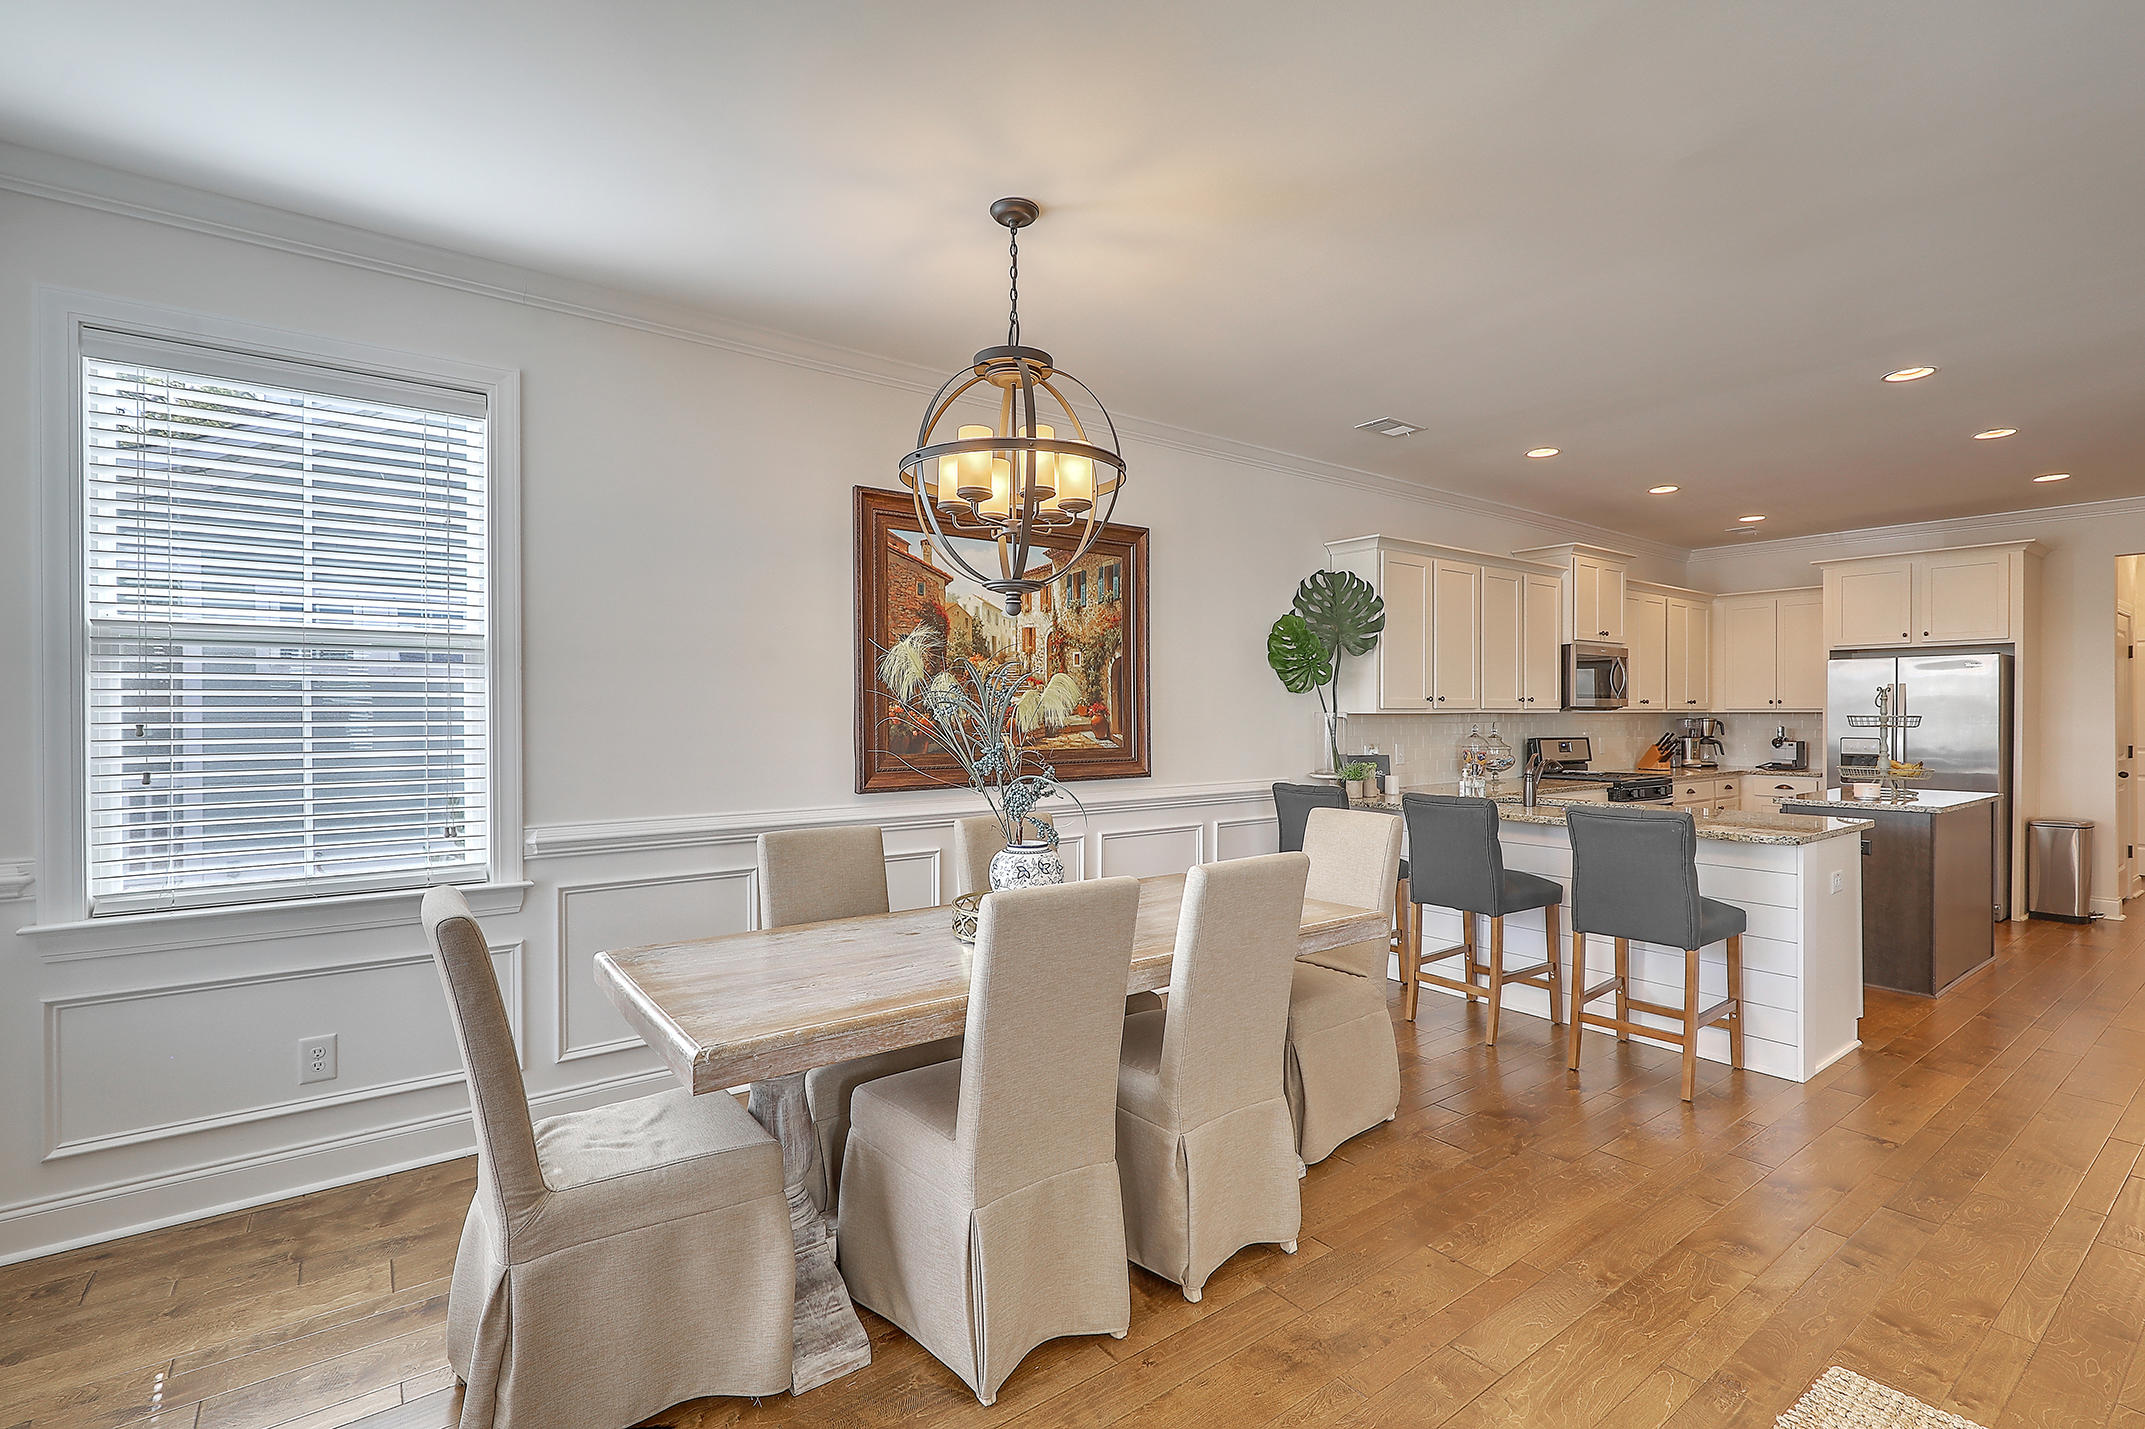 Park West Homes For Sale - 3412 Salterbeck, Mount Pleasant, SC - 7